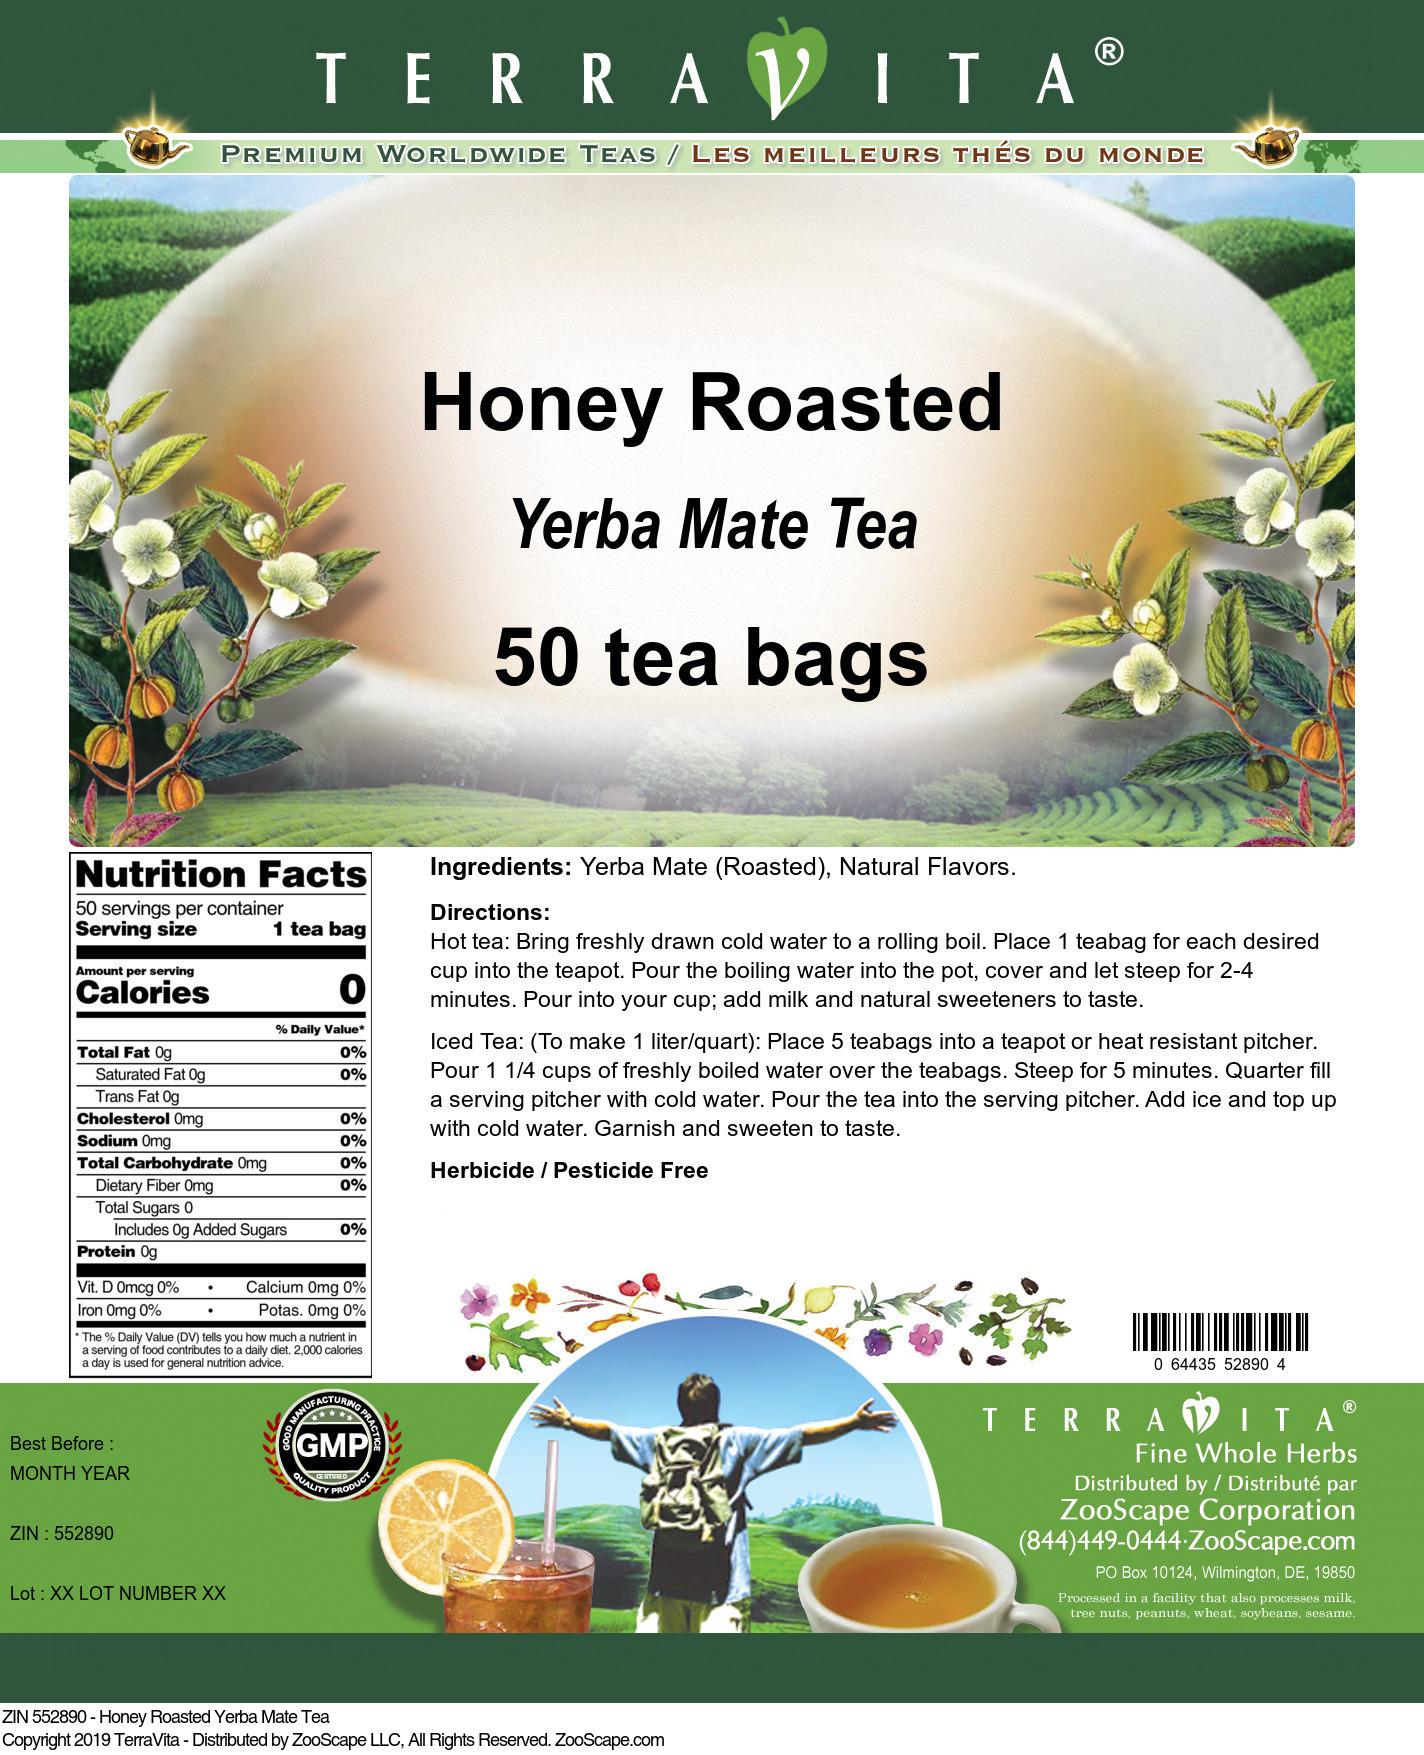 Honey Roasted Yerba Mate